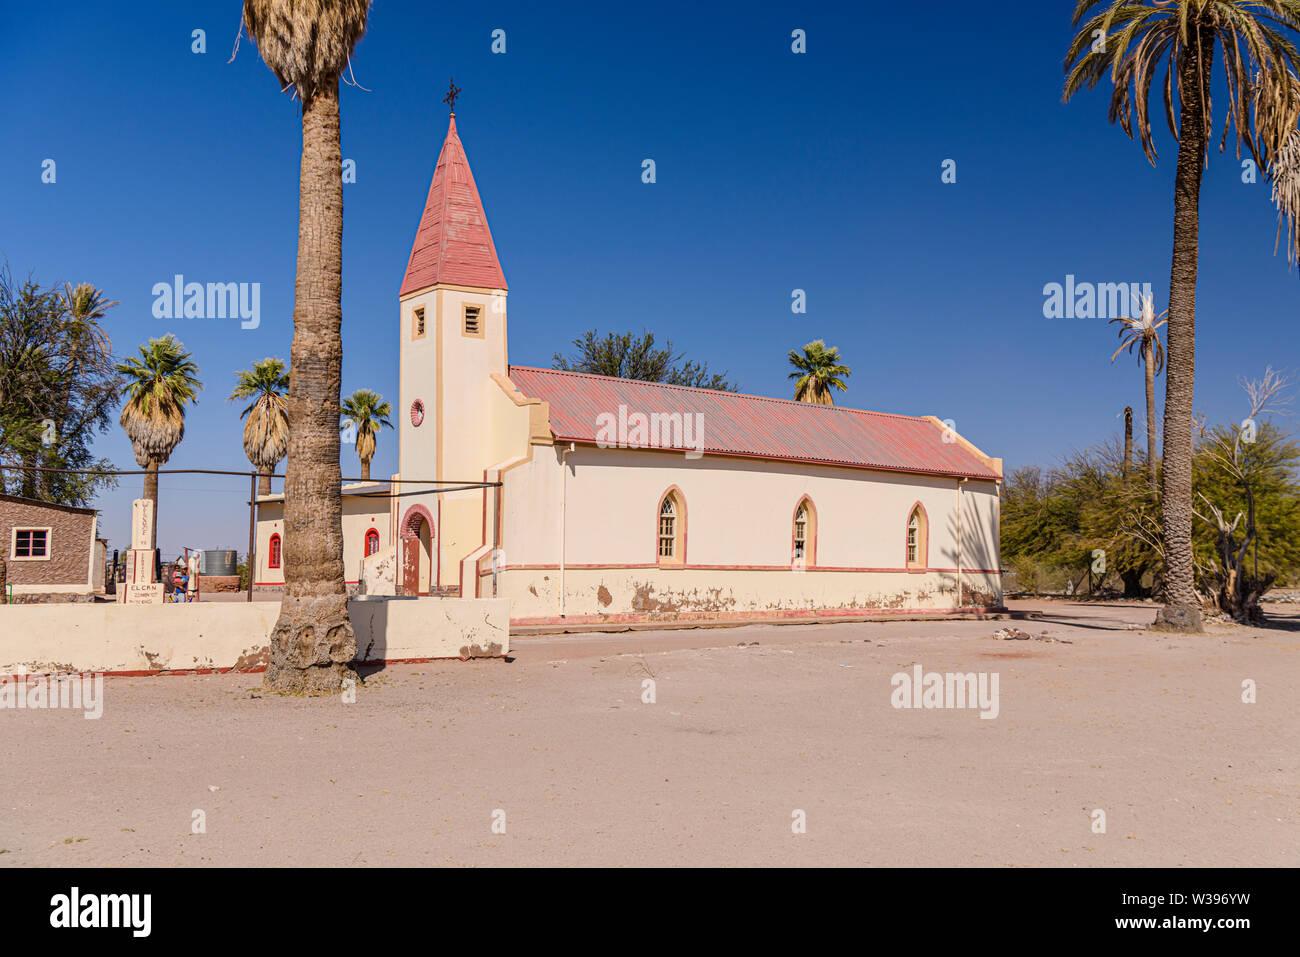 Local church in the Namibian village of Hoachanas, Namibia Stock Photo